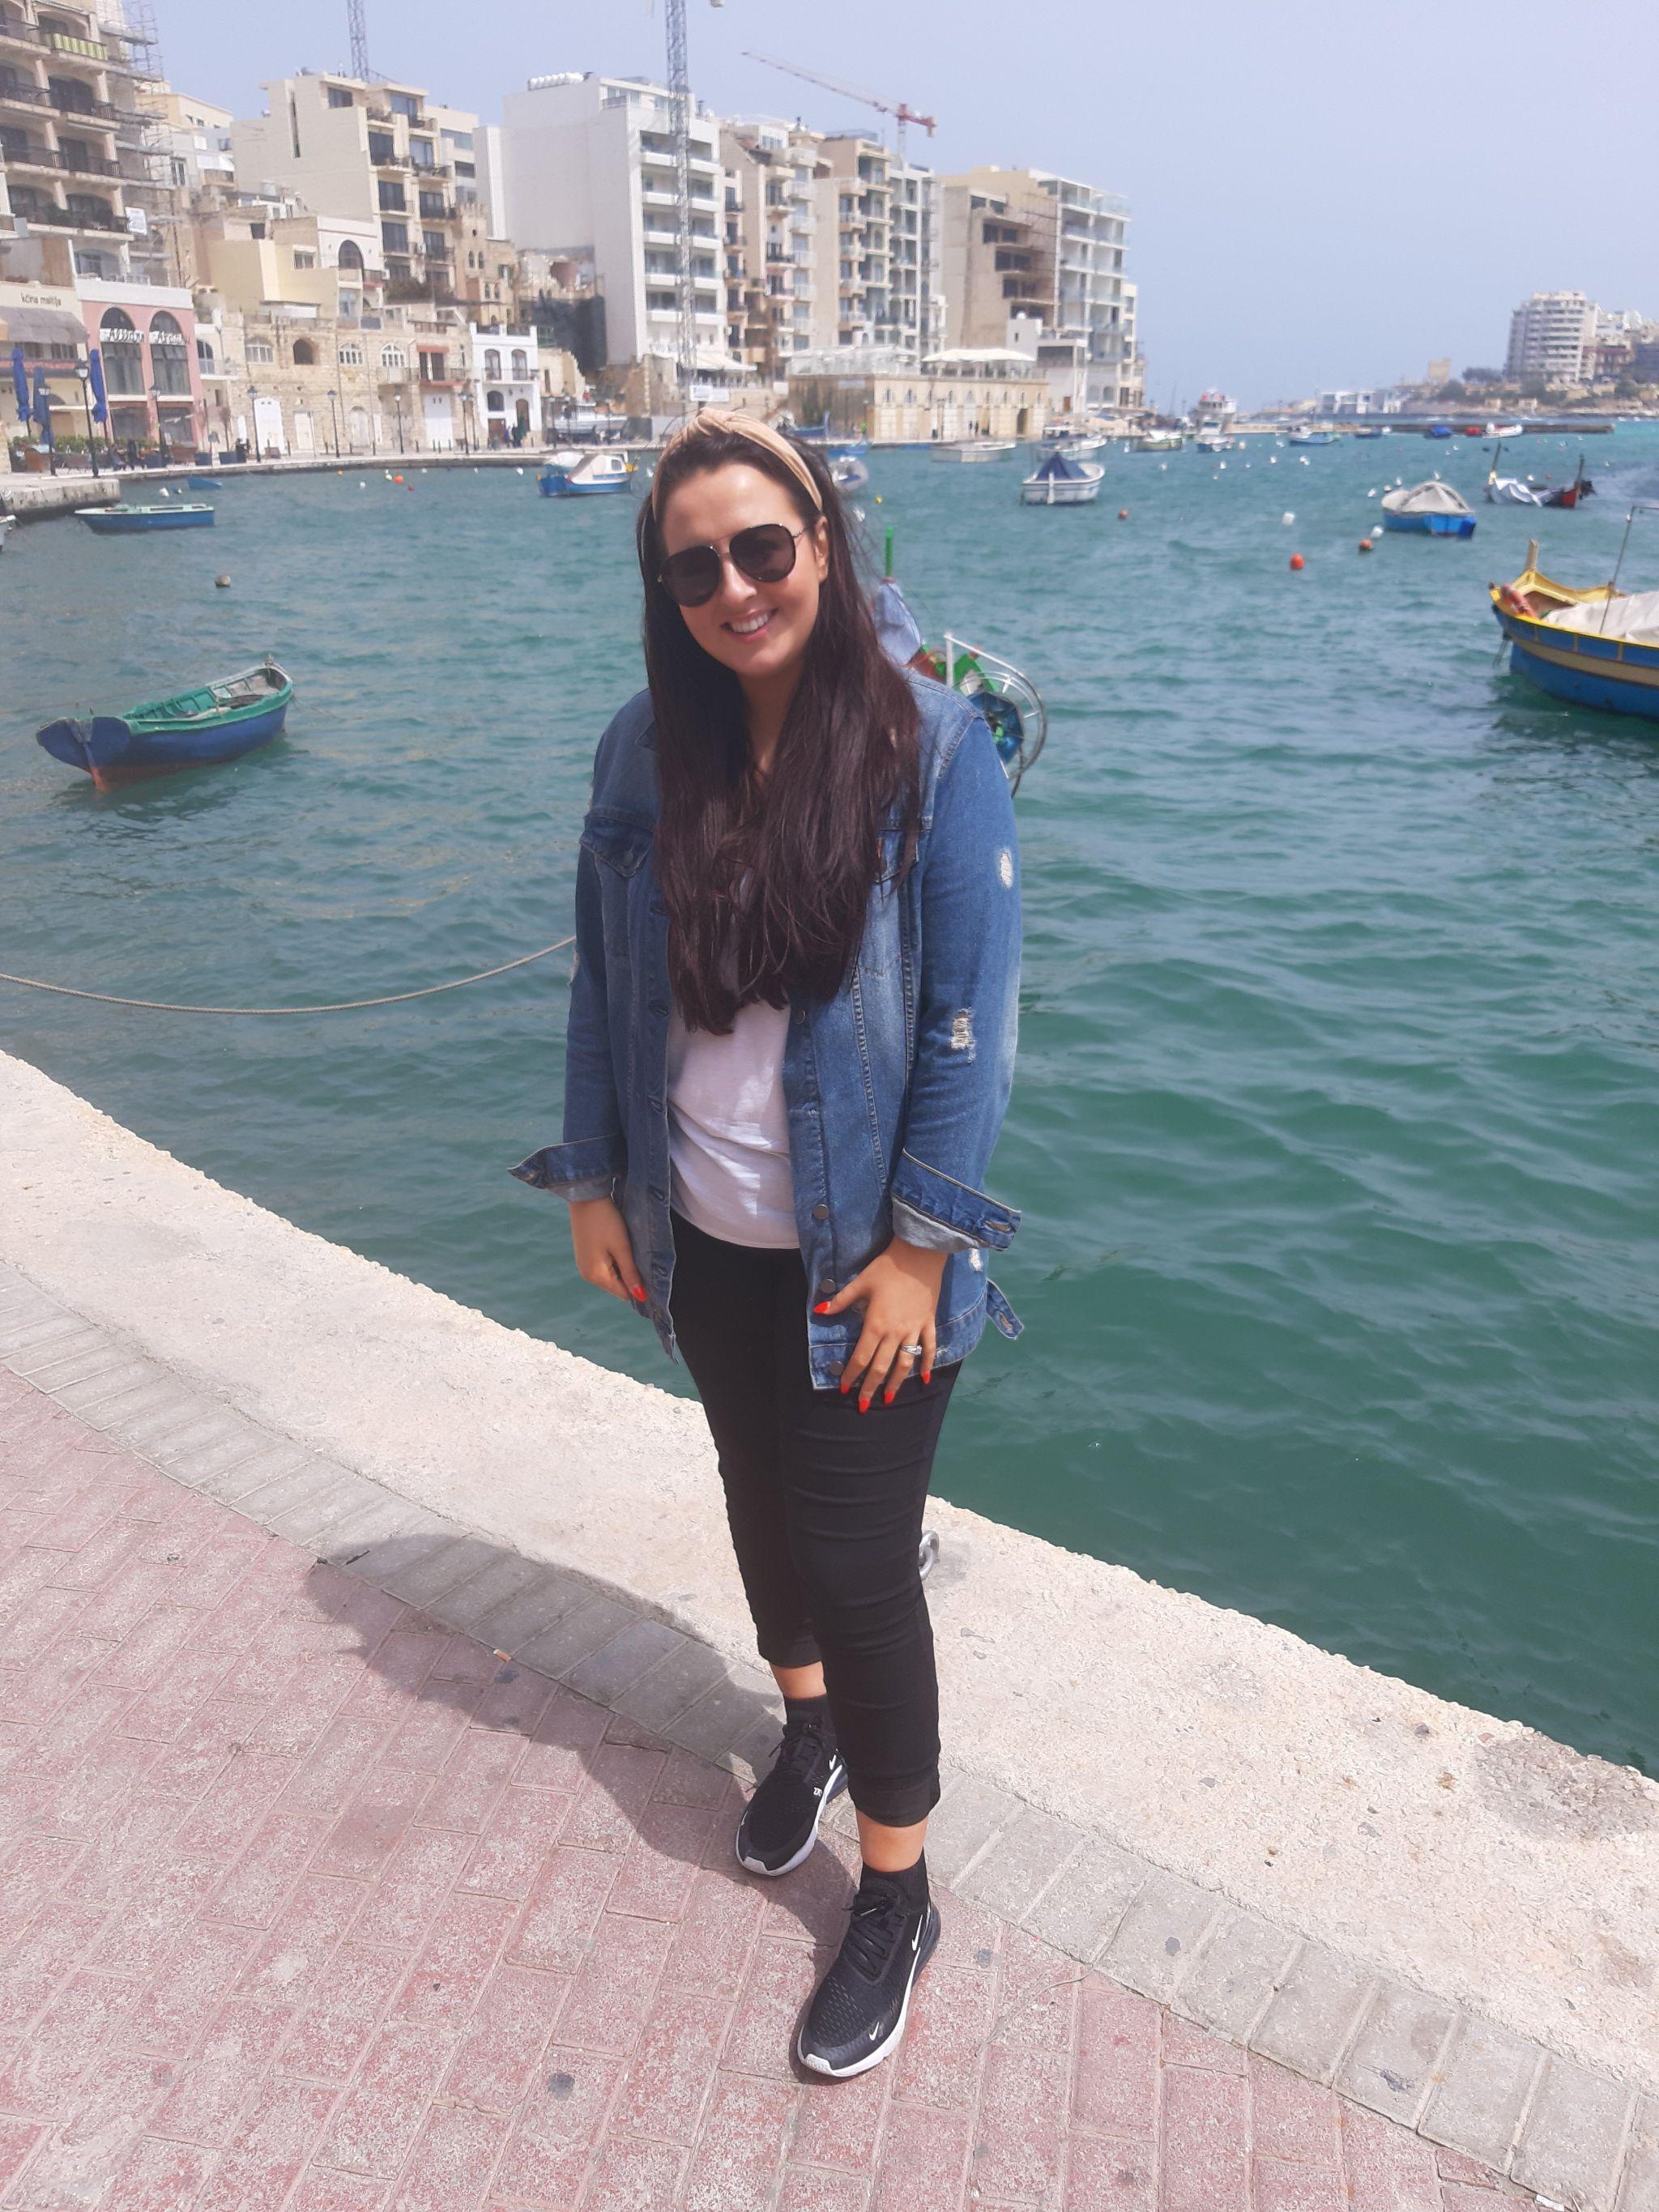 malta, malta blog post, live lavishly, Gozo, Popeye village, Disney Malta, blue lagoon, things to do Malta